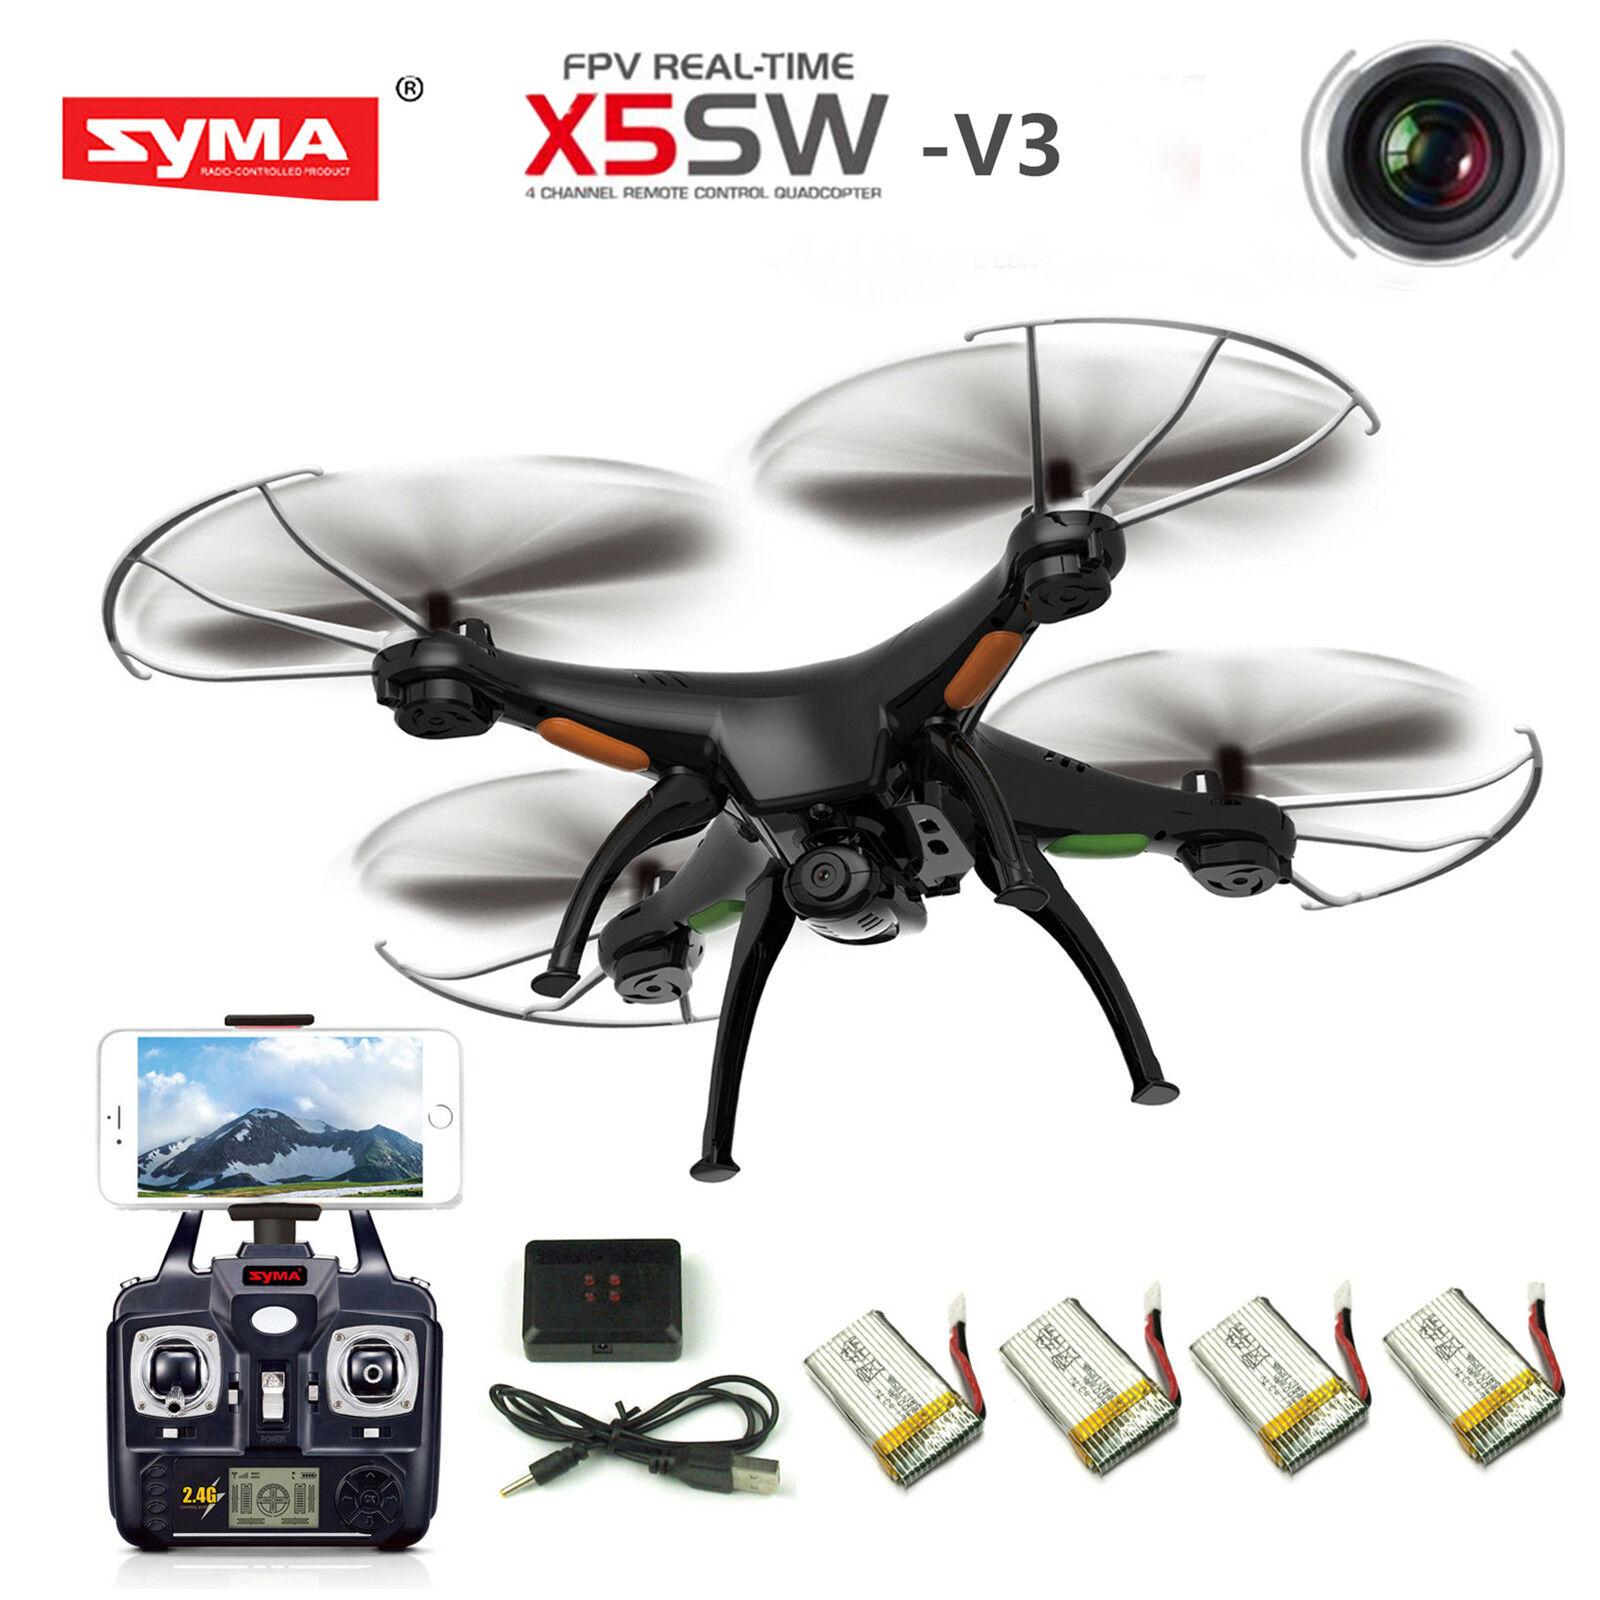 Syma x5sw-v3 wifi 2.4ghz 4ch rc quadcopter drohne mit hd - kamera rtf + 5 batterien